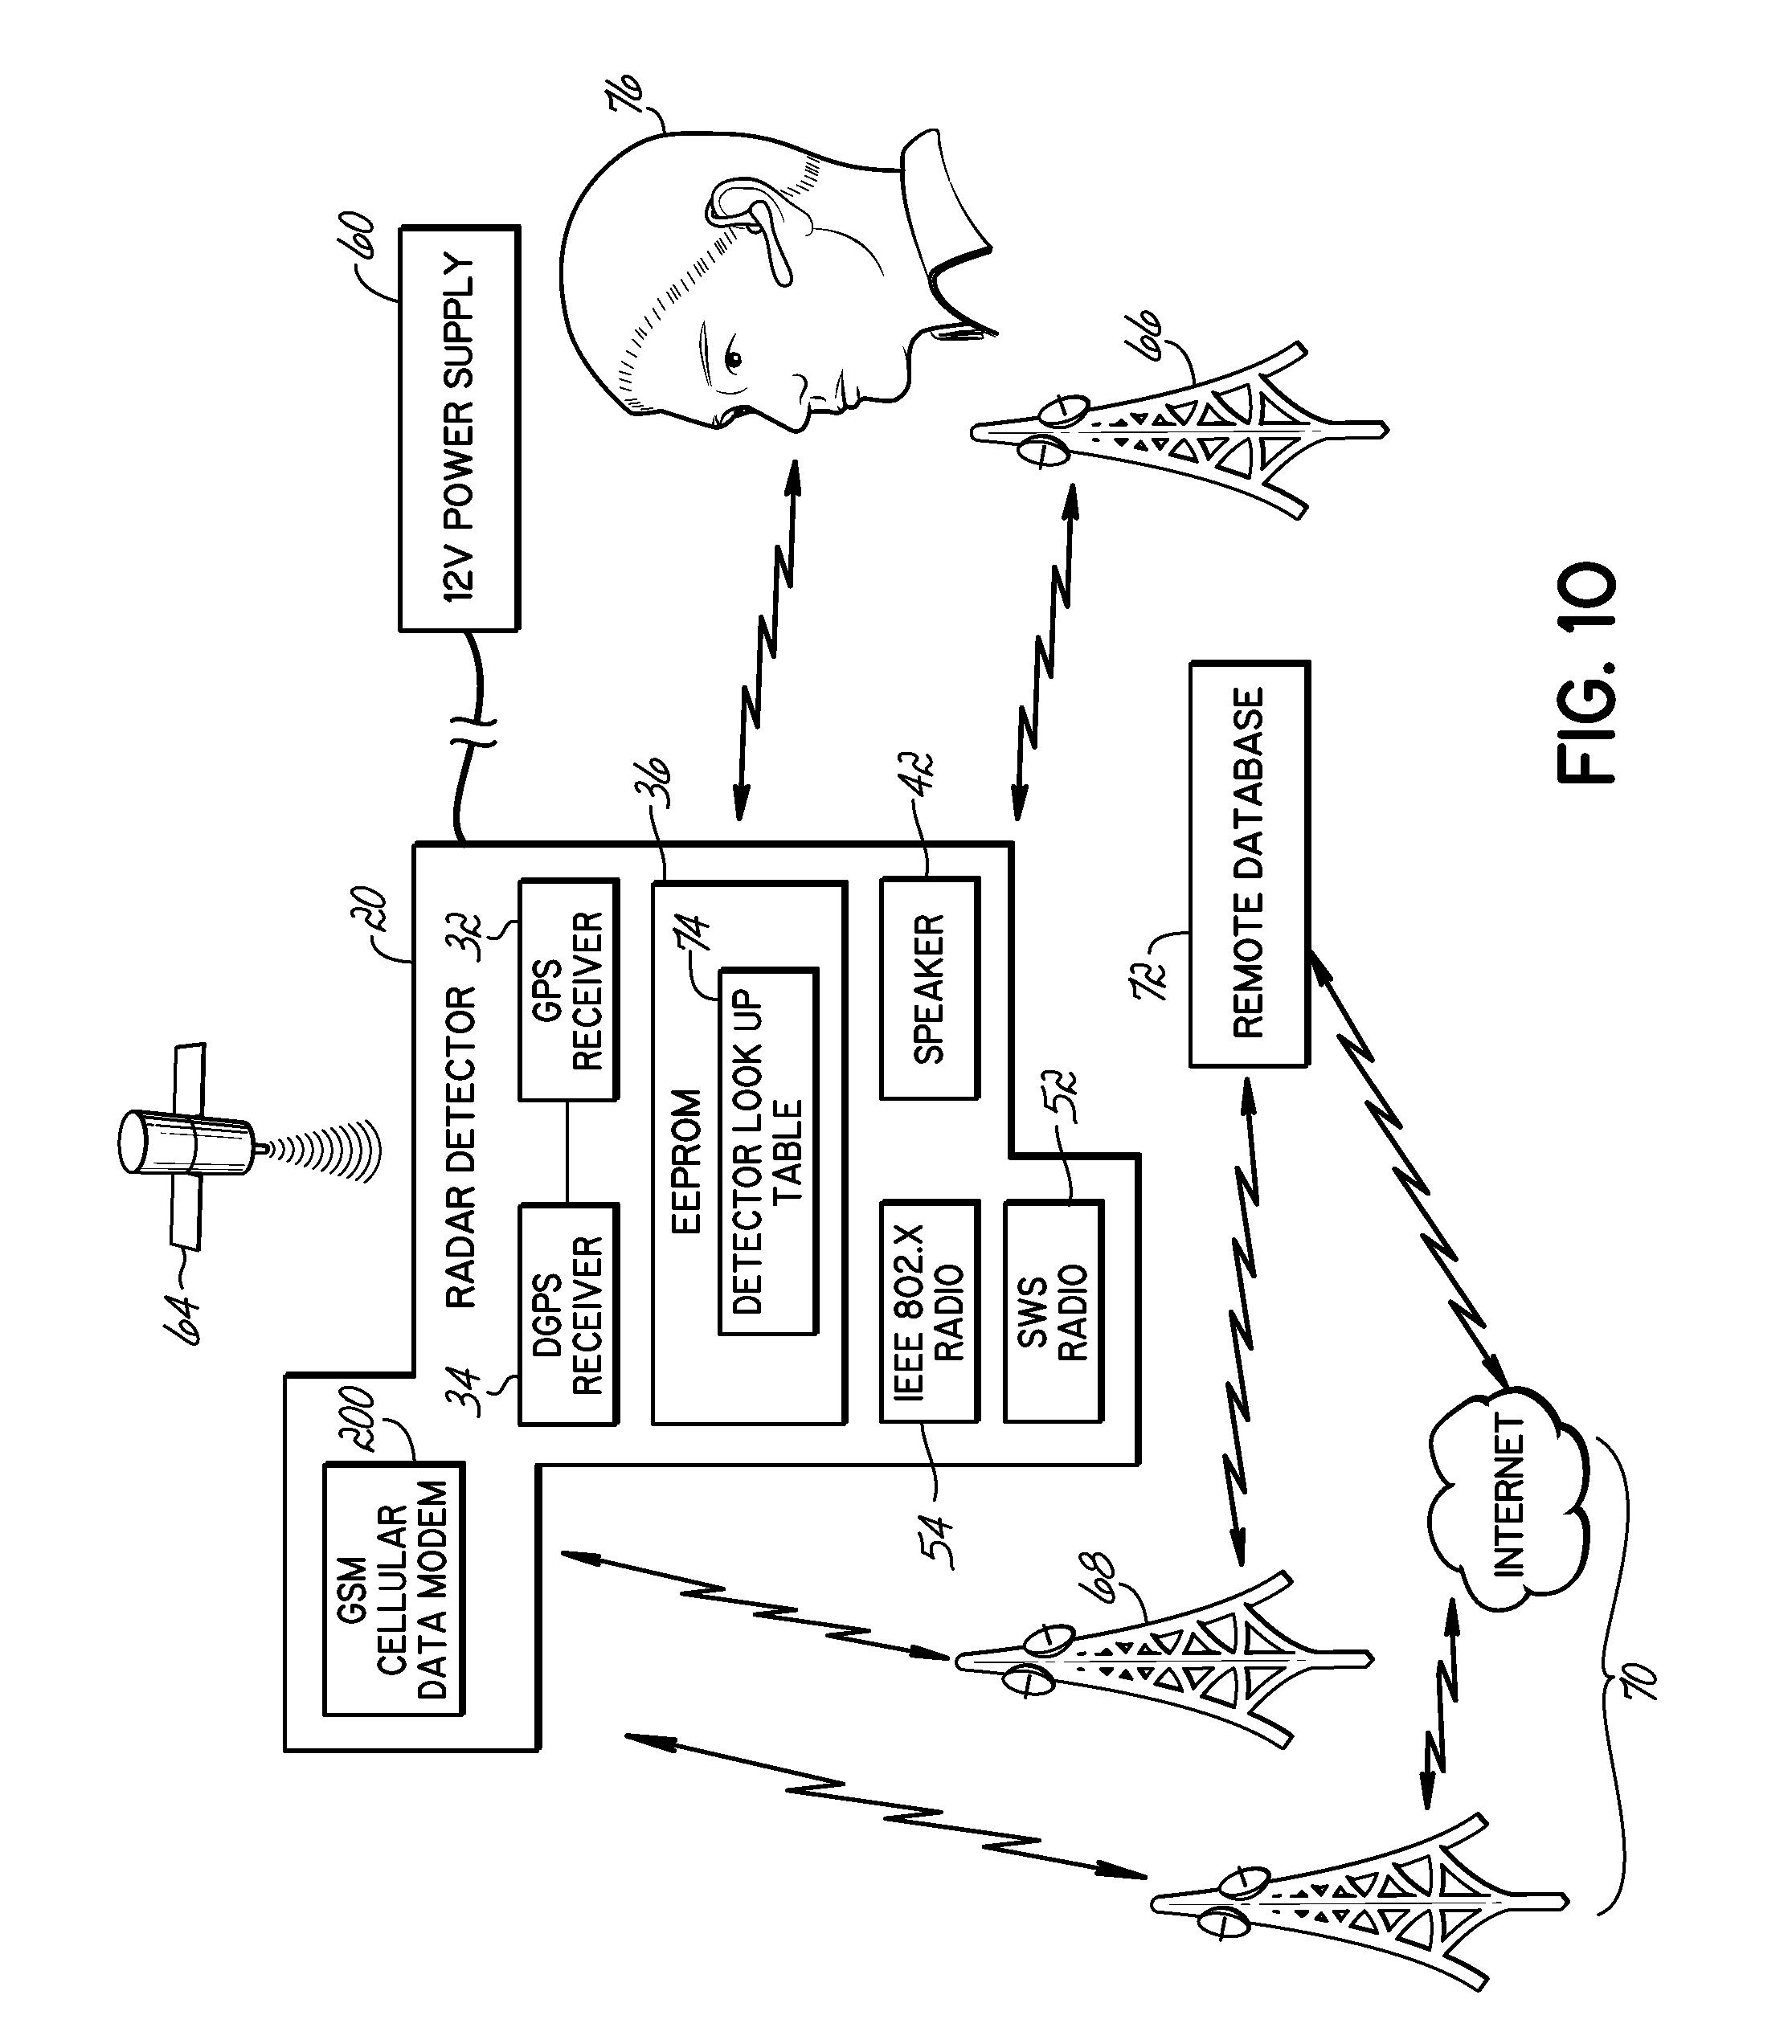 Sony Receiver Wiring Diagram